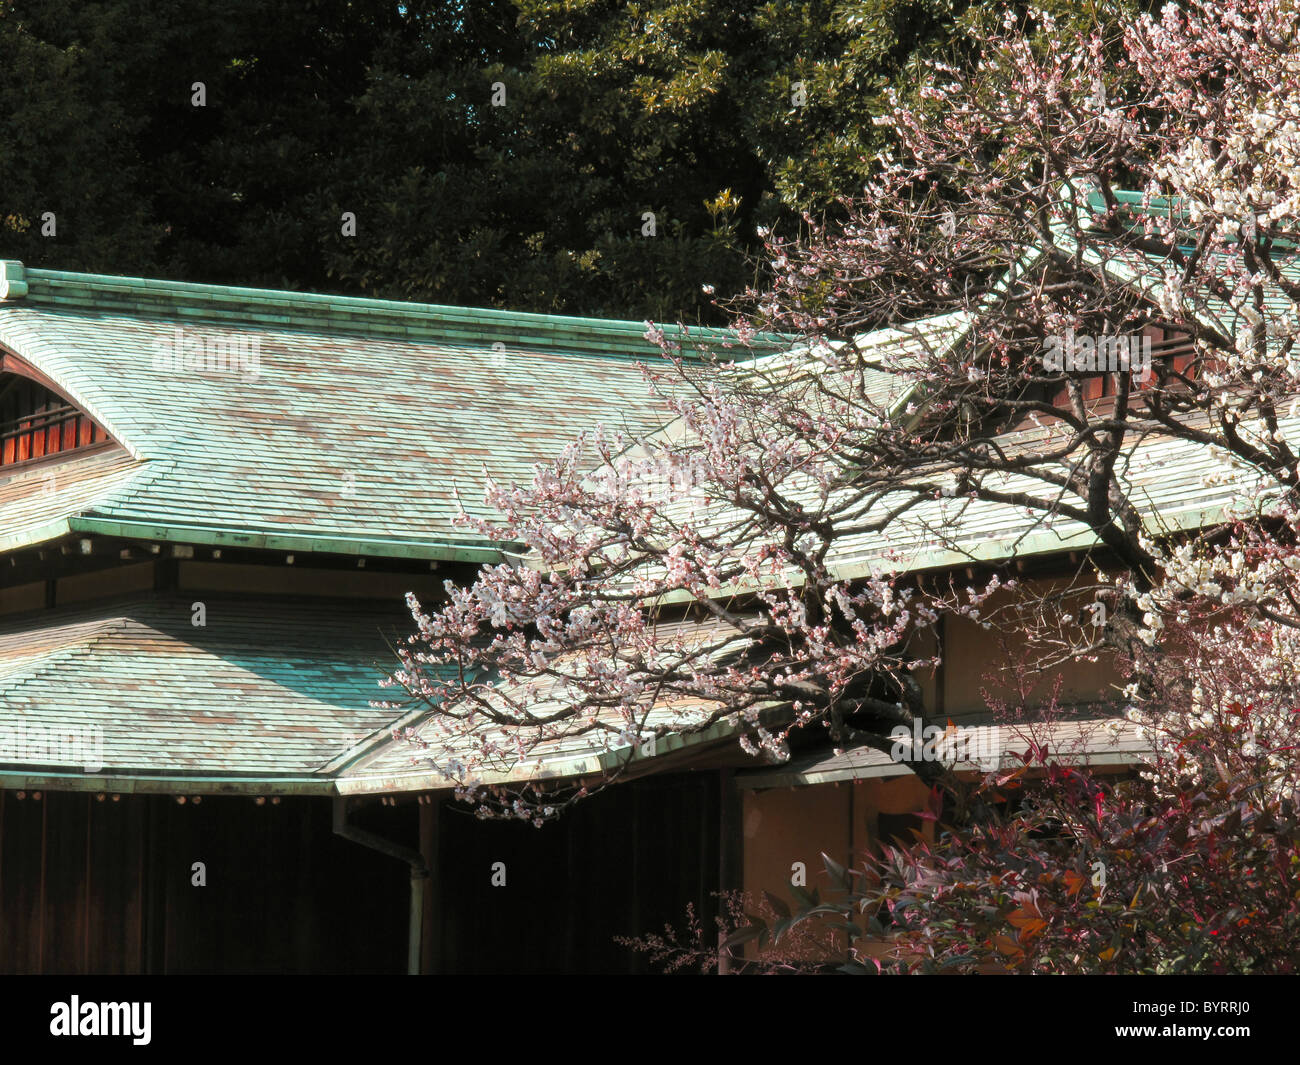 Suwano-chaya Tea House in the Imperial palace east gardens, Tokyo, Japan. Stock Photo